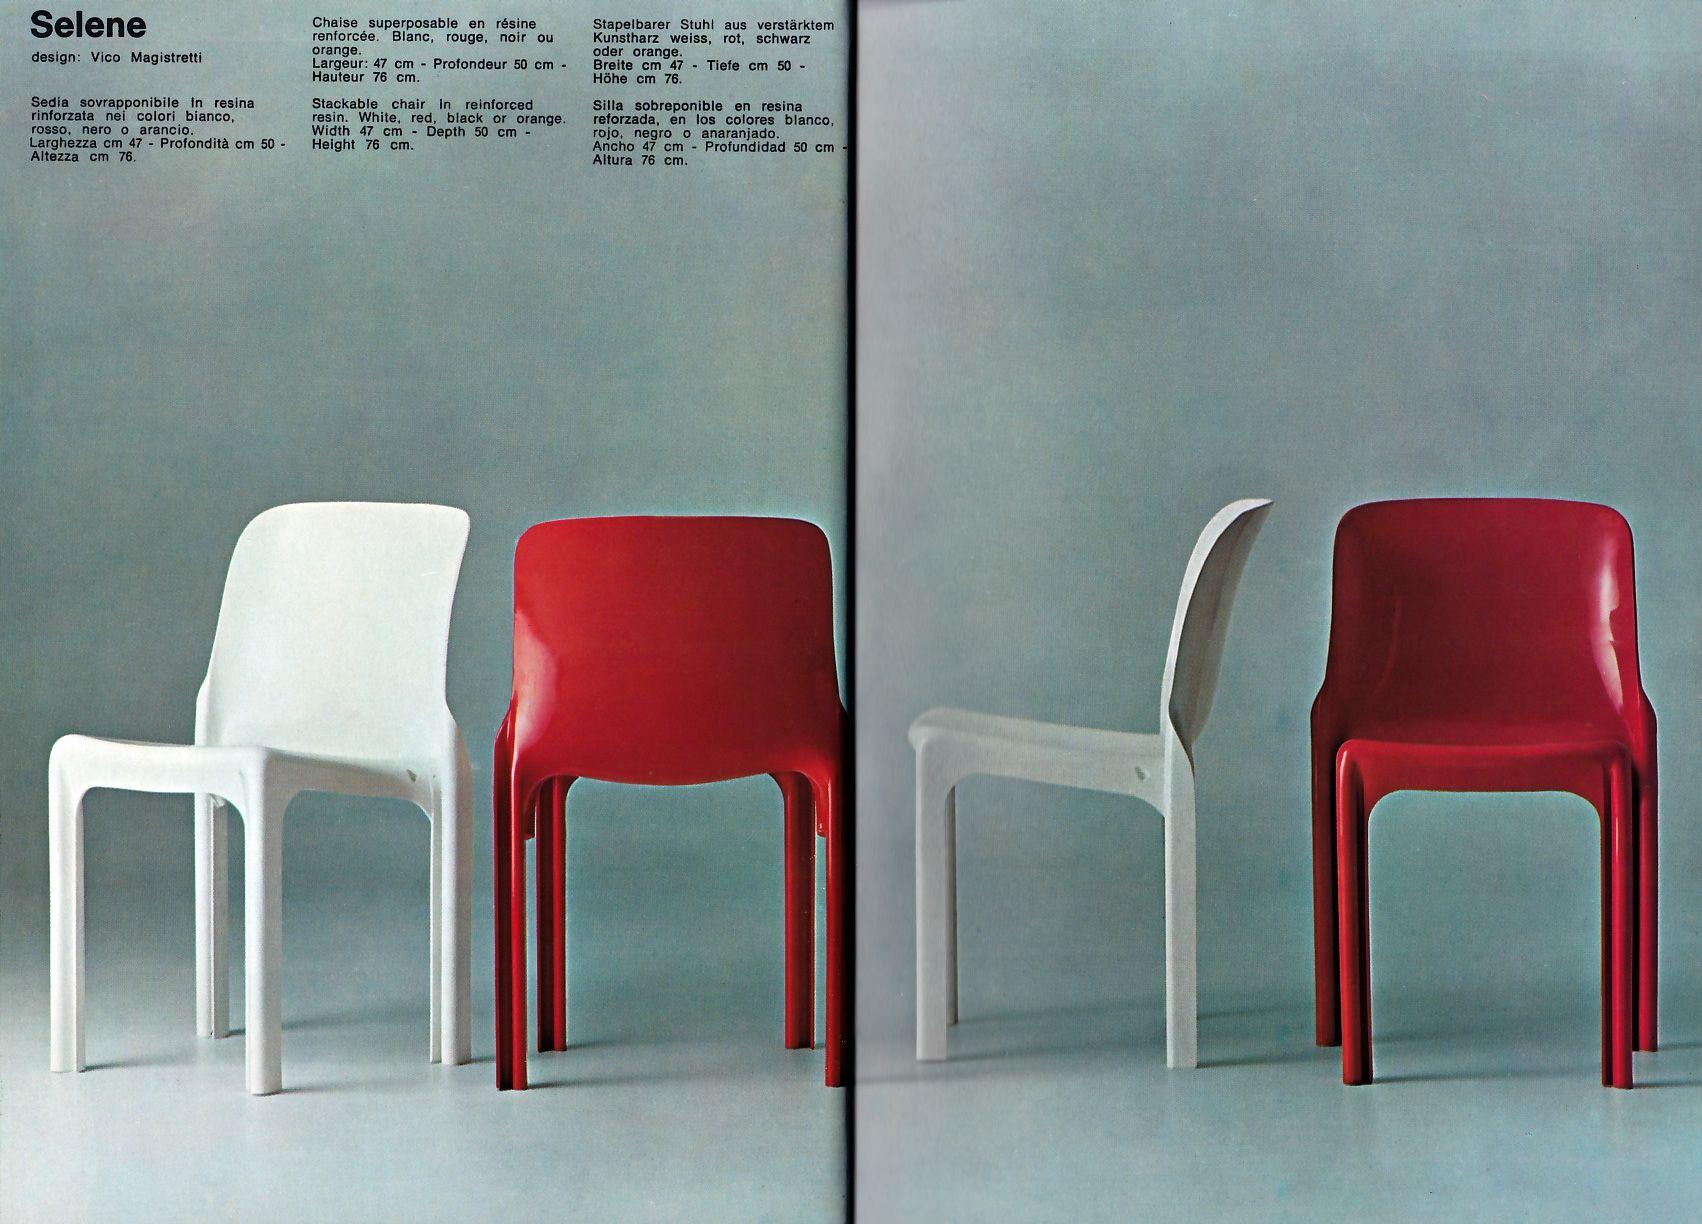 Sedie Gavina ~ Selene stackable chair artemide by vico magistretti artemide